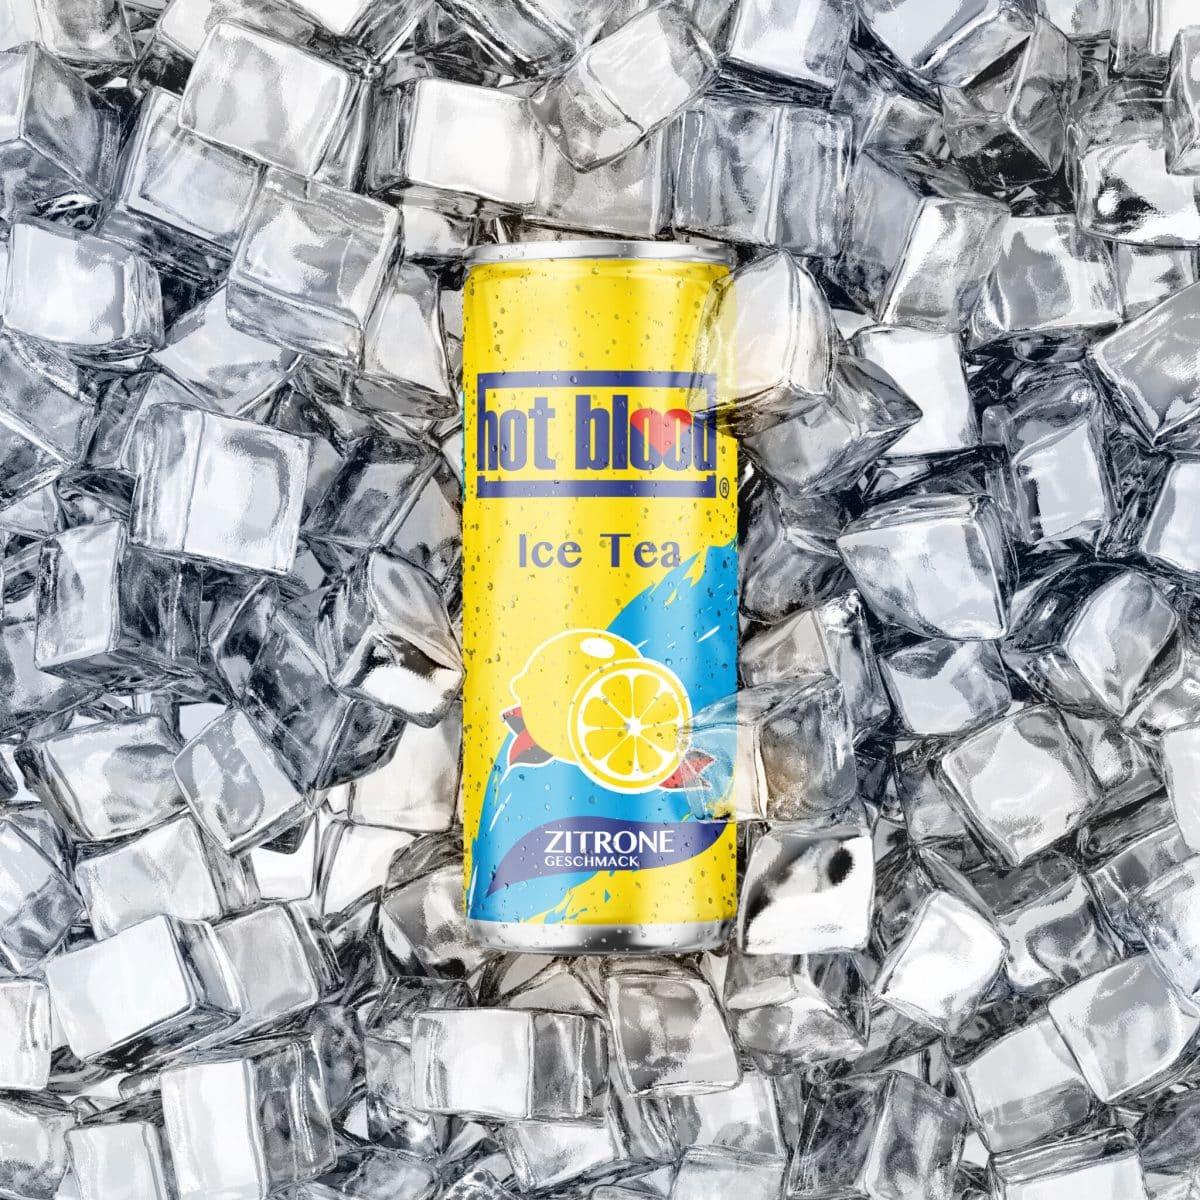 Hot Blood Ice Tea Zitrone 330ml